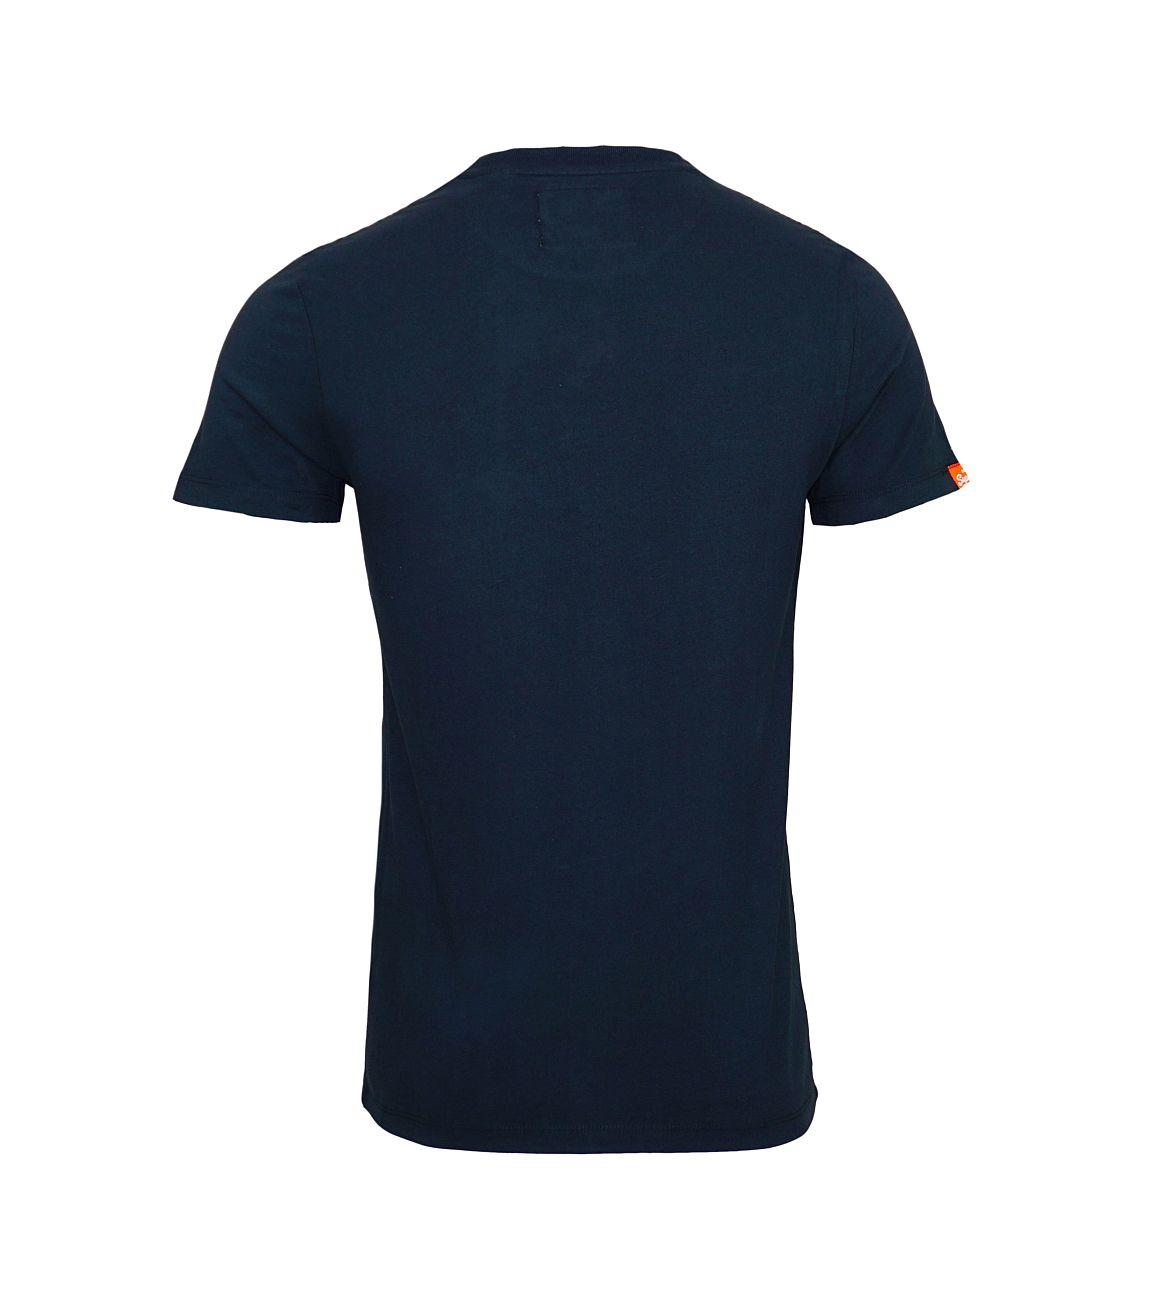 Superdry T-Shirt Orange Label VNTGE EMB VEE Tee M10001NS1 Eclipse Navy F18-SDT1